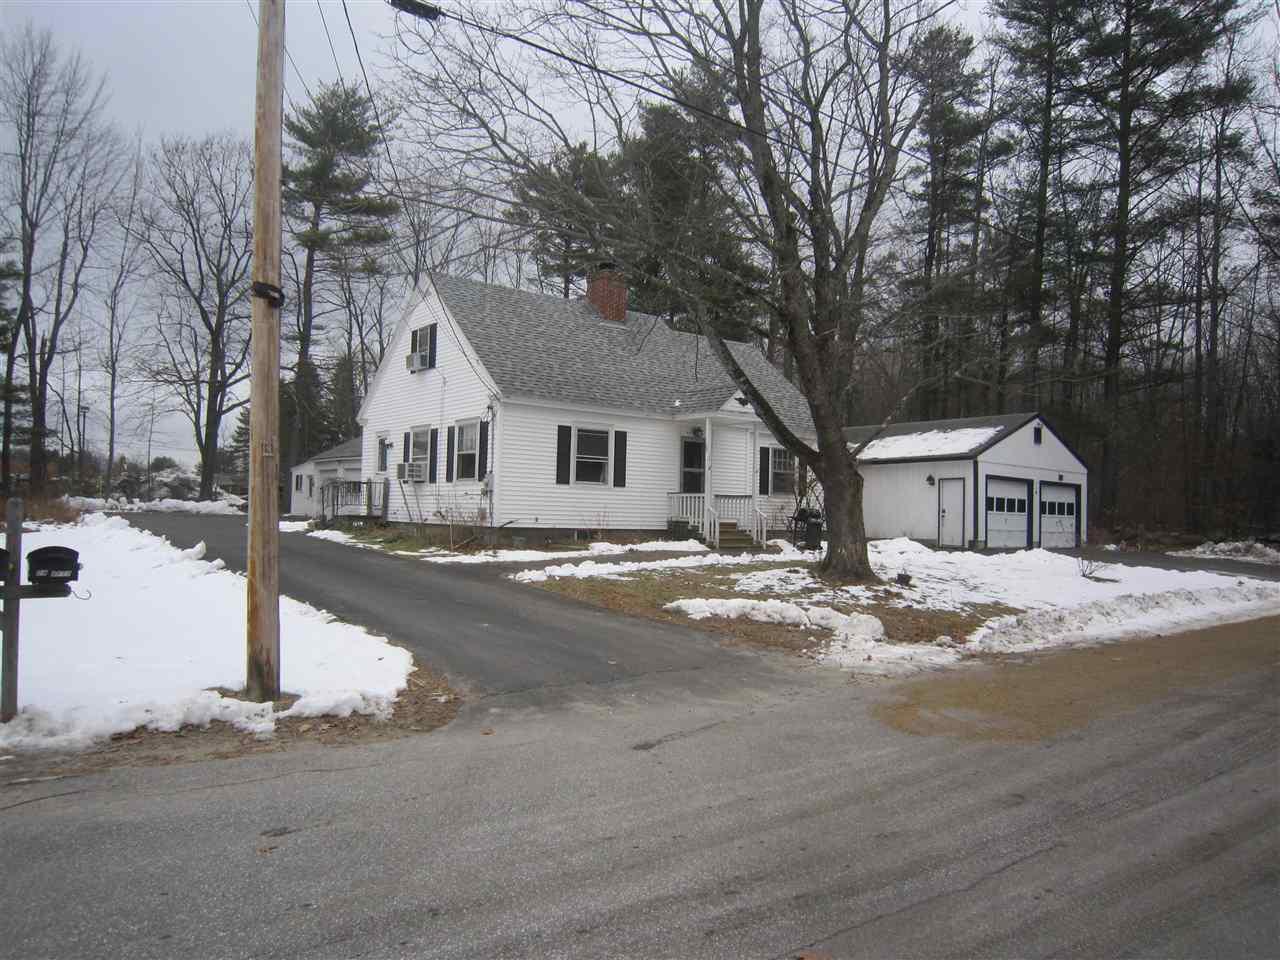 Photo of 24 Goodrich Road Wolfeboro NH 03894